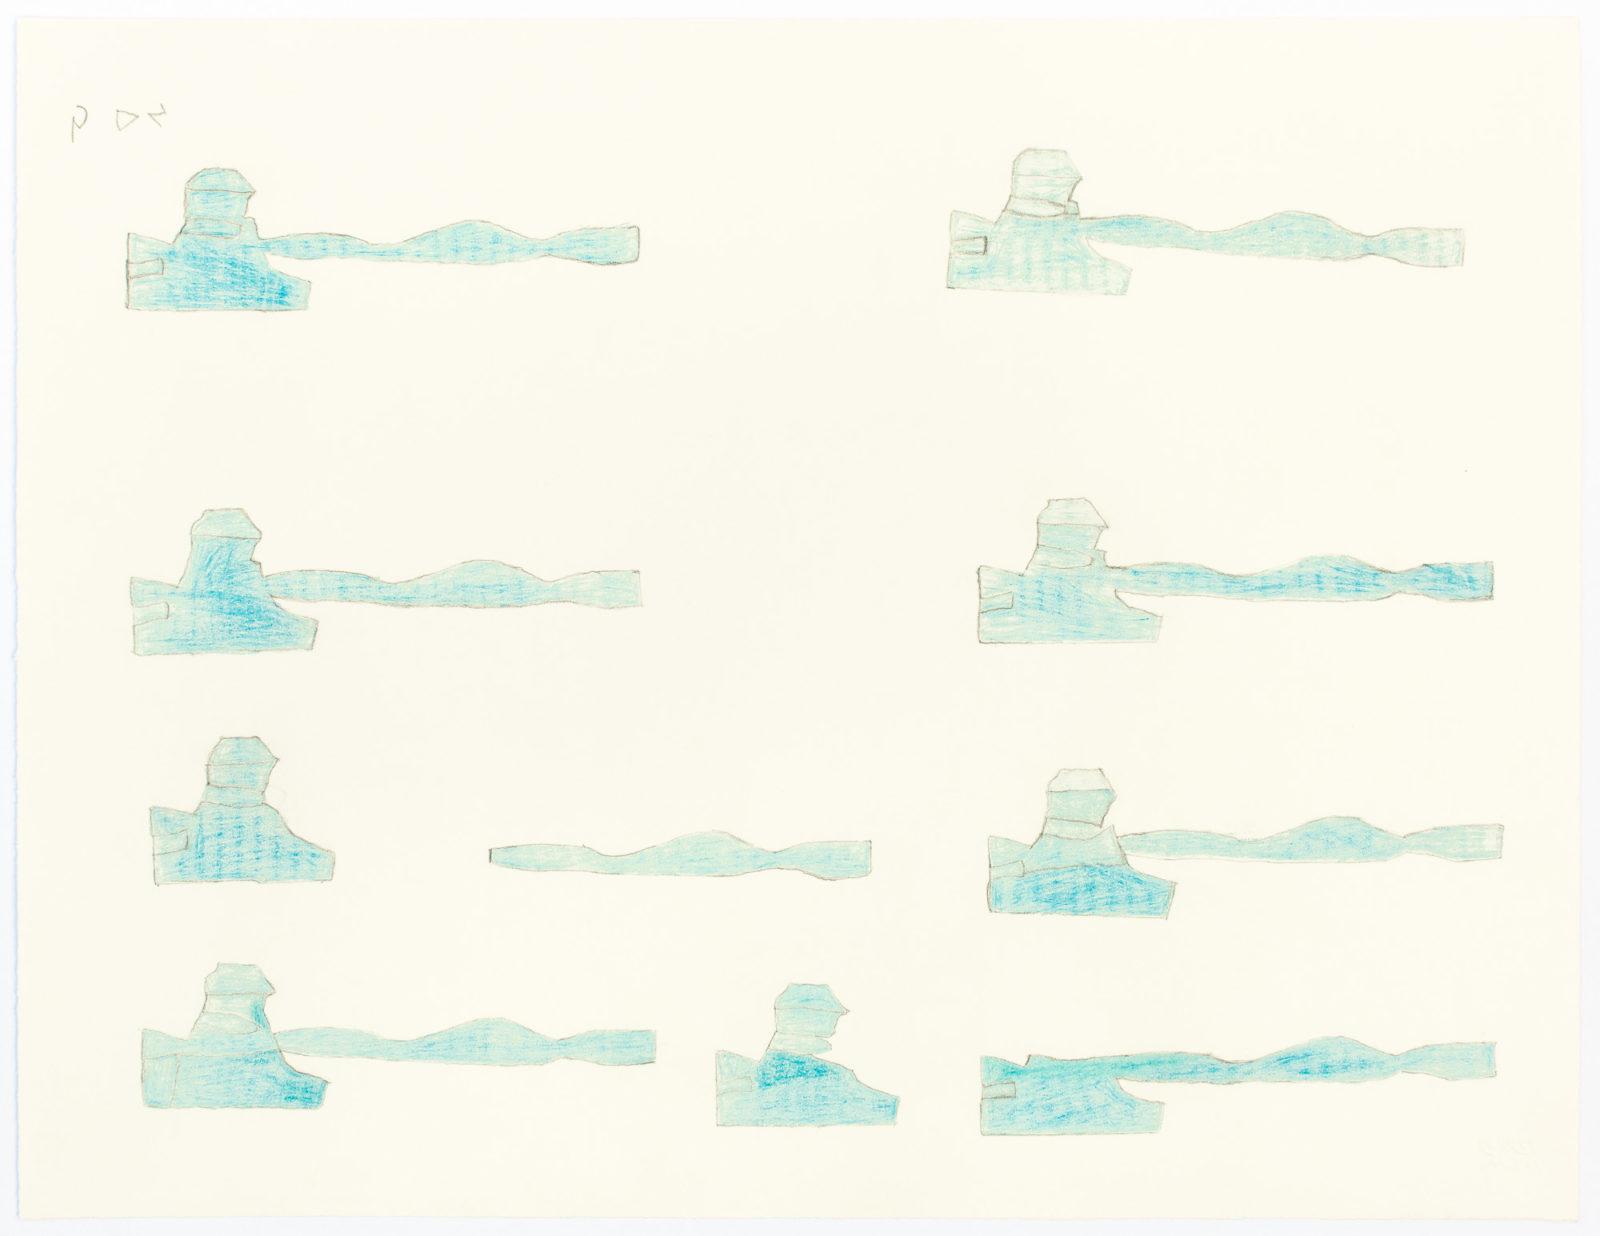 Sheojuk Etidlooie - untitled (abstract composition)